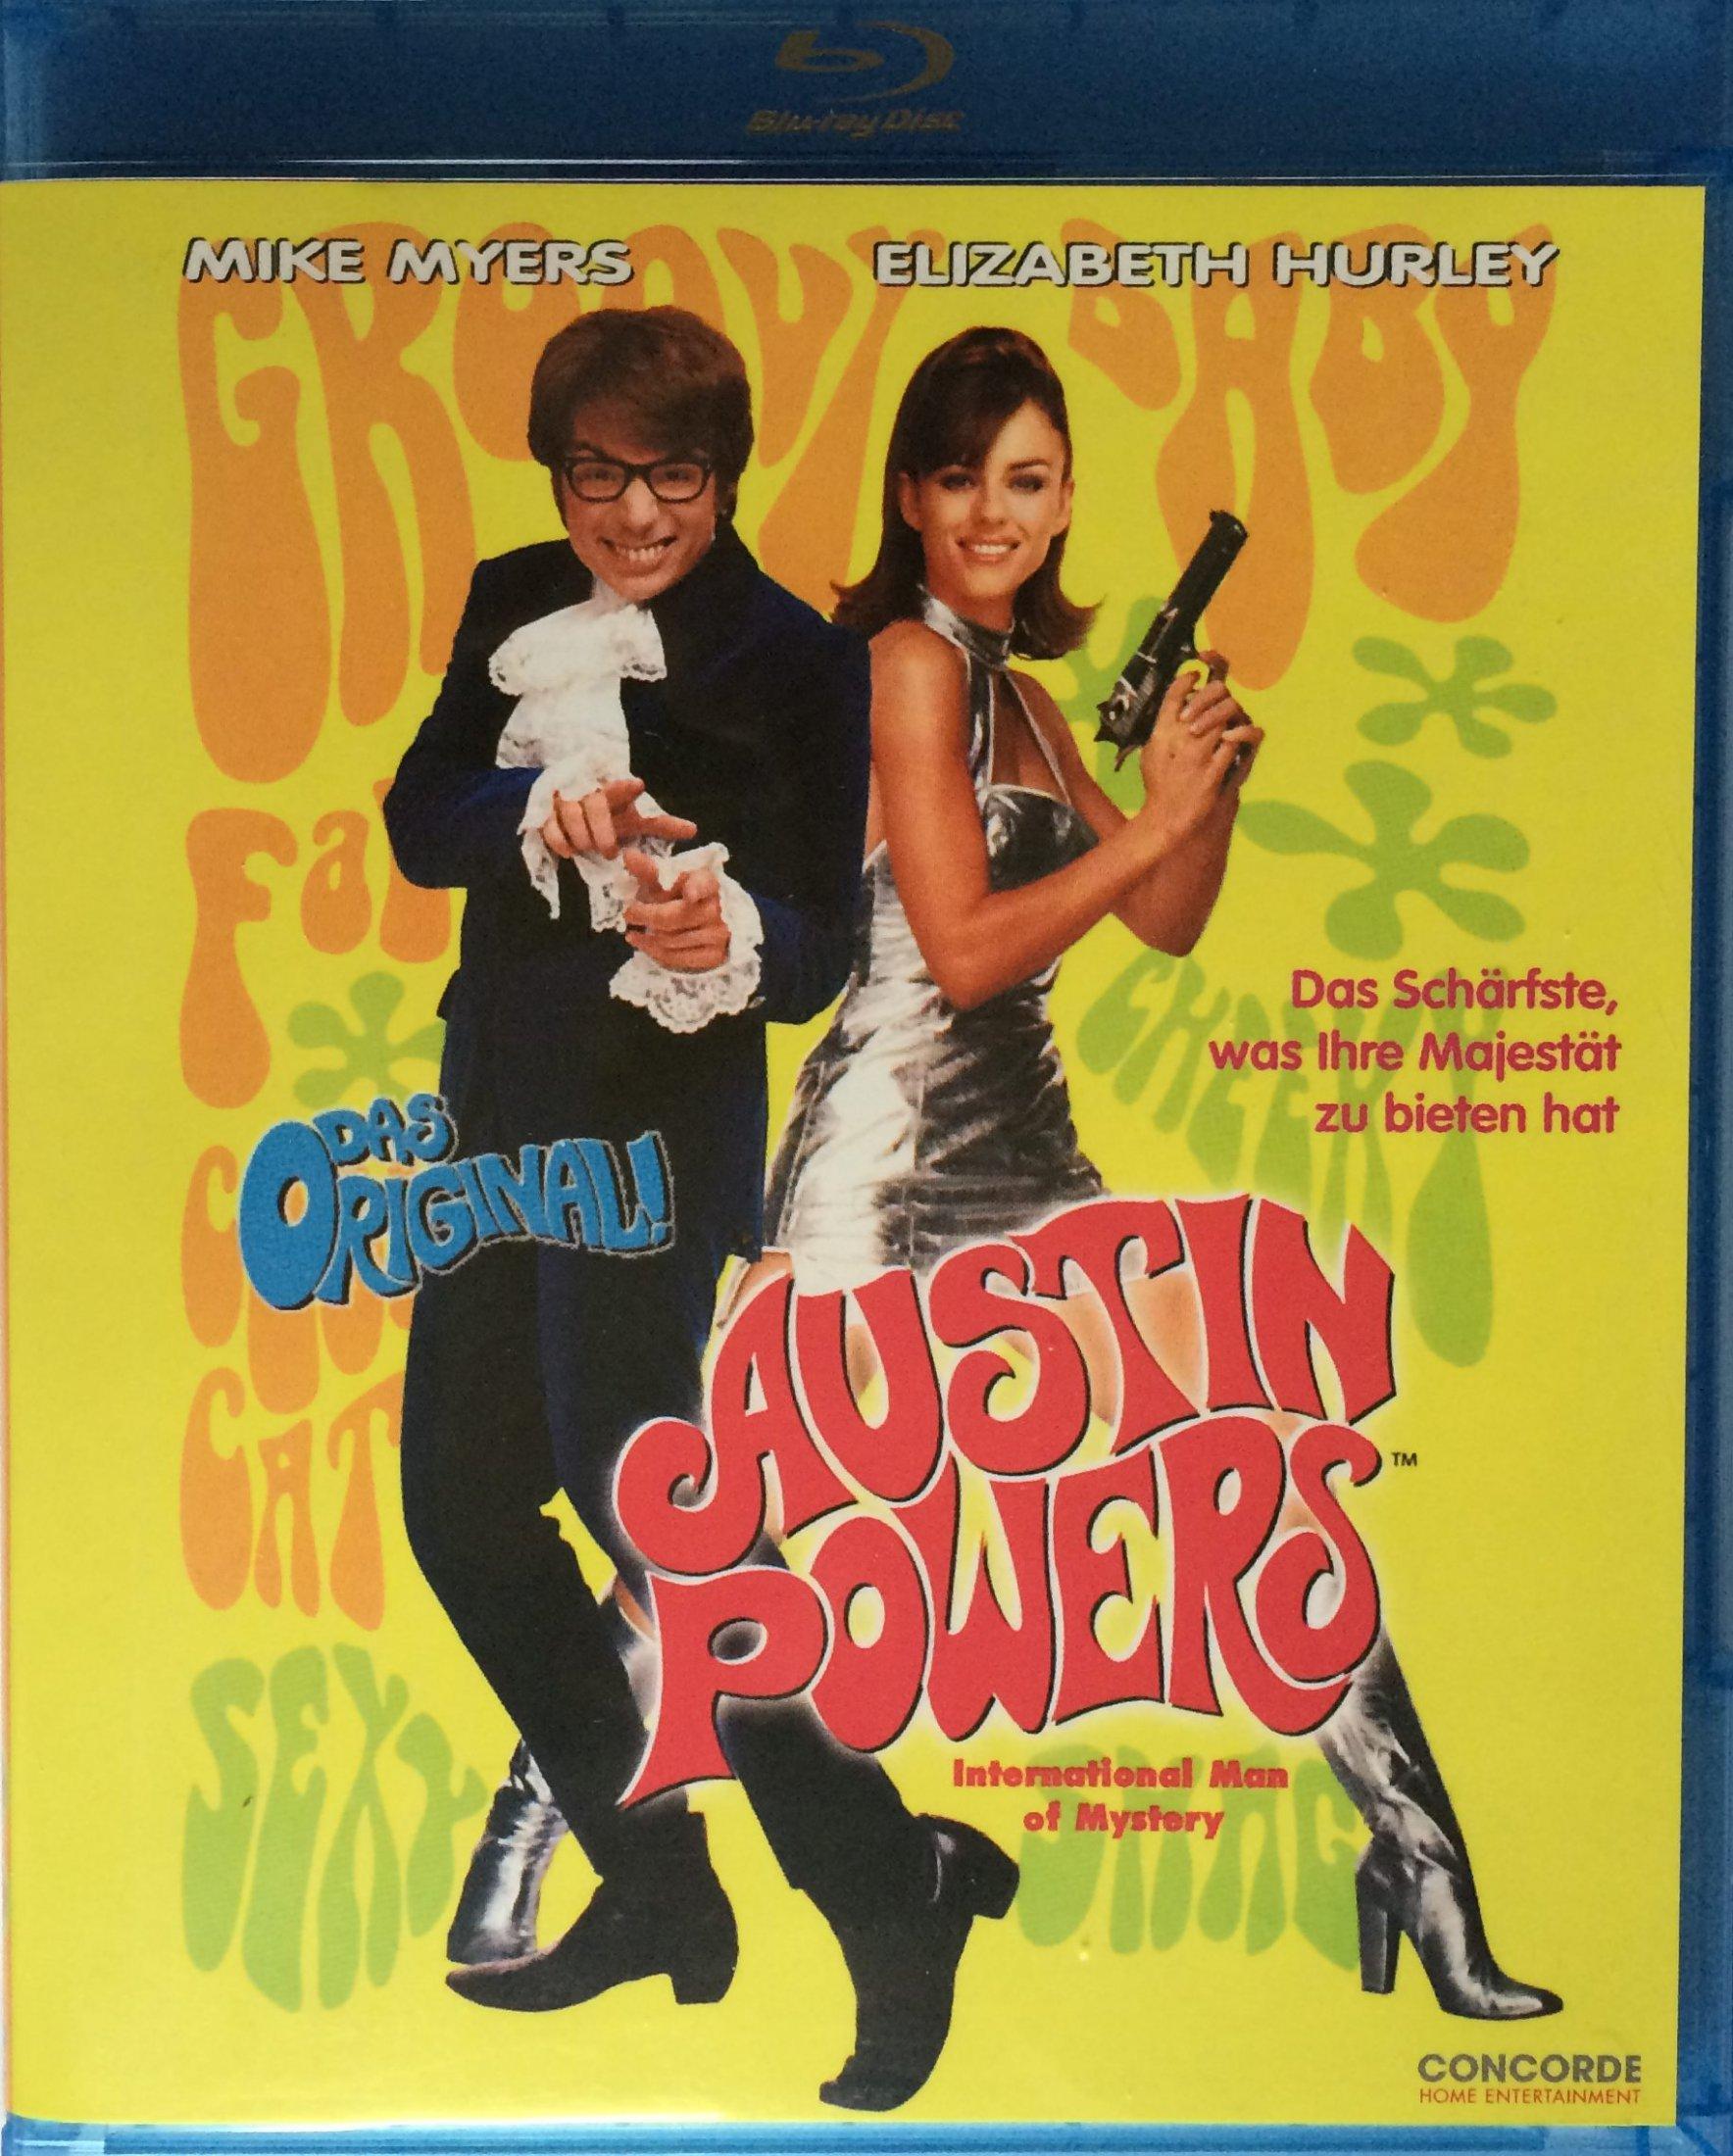 Austin Powers Front